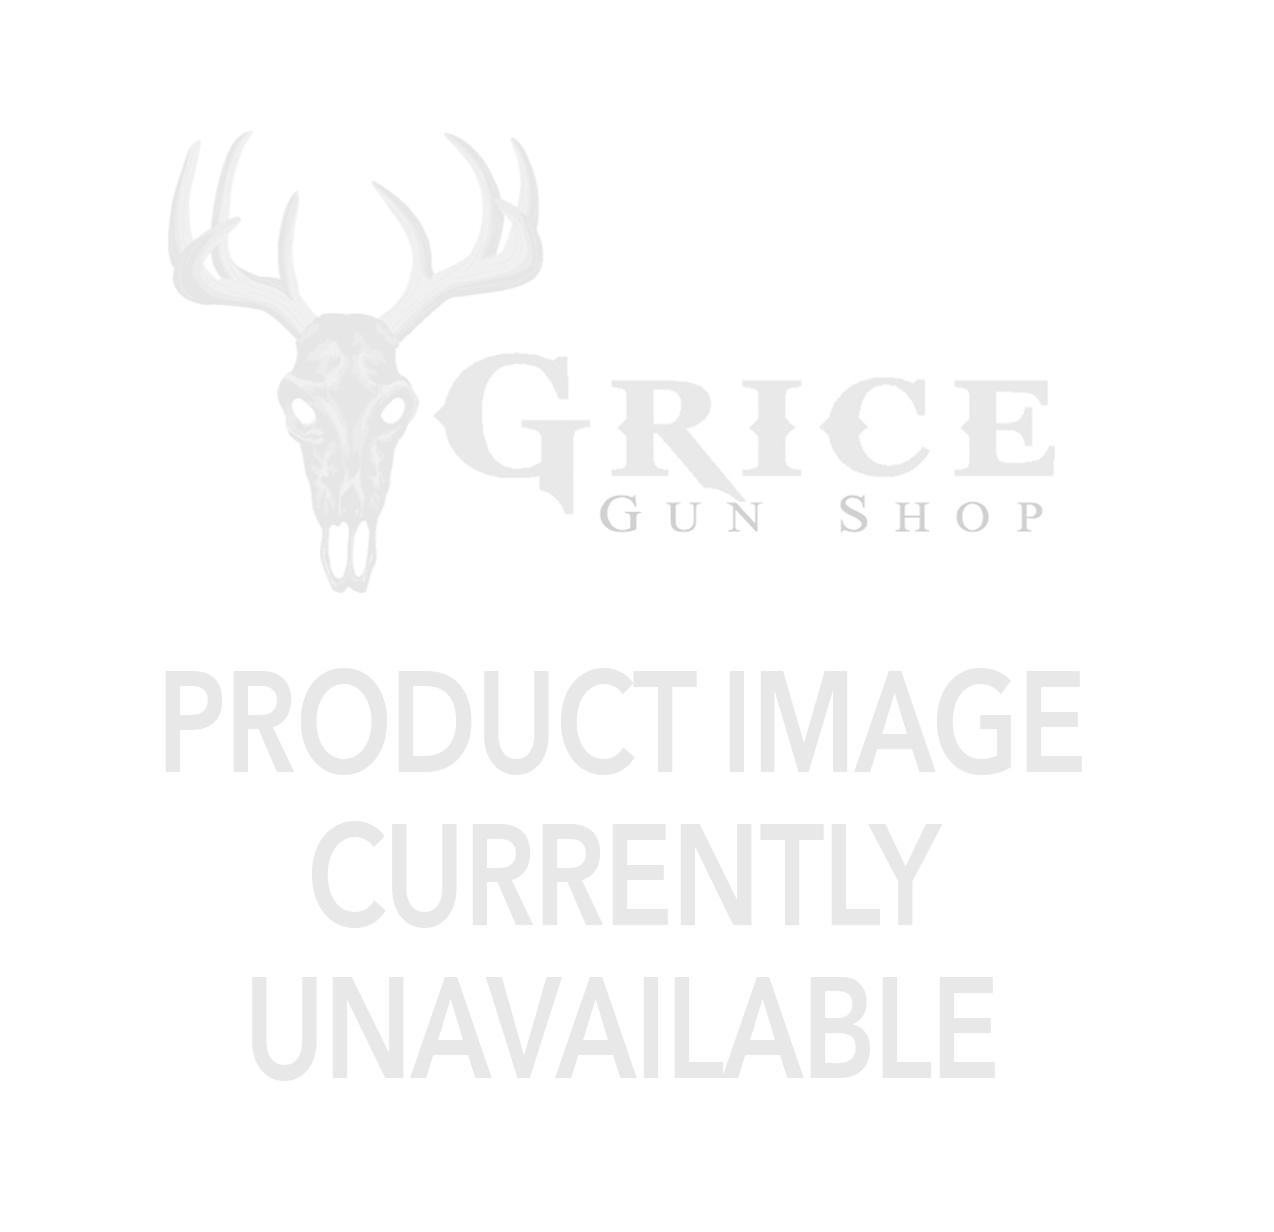 ATI - GSG 1911/FireFly Thread Adapter